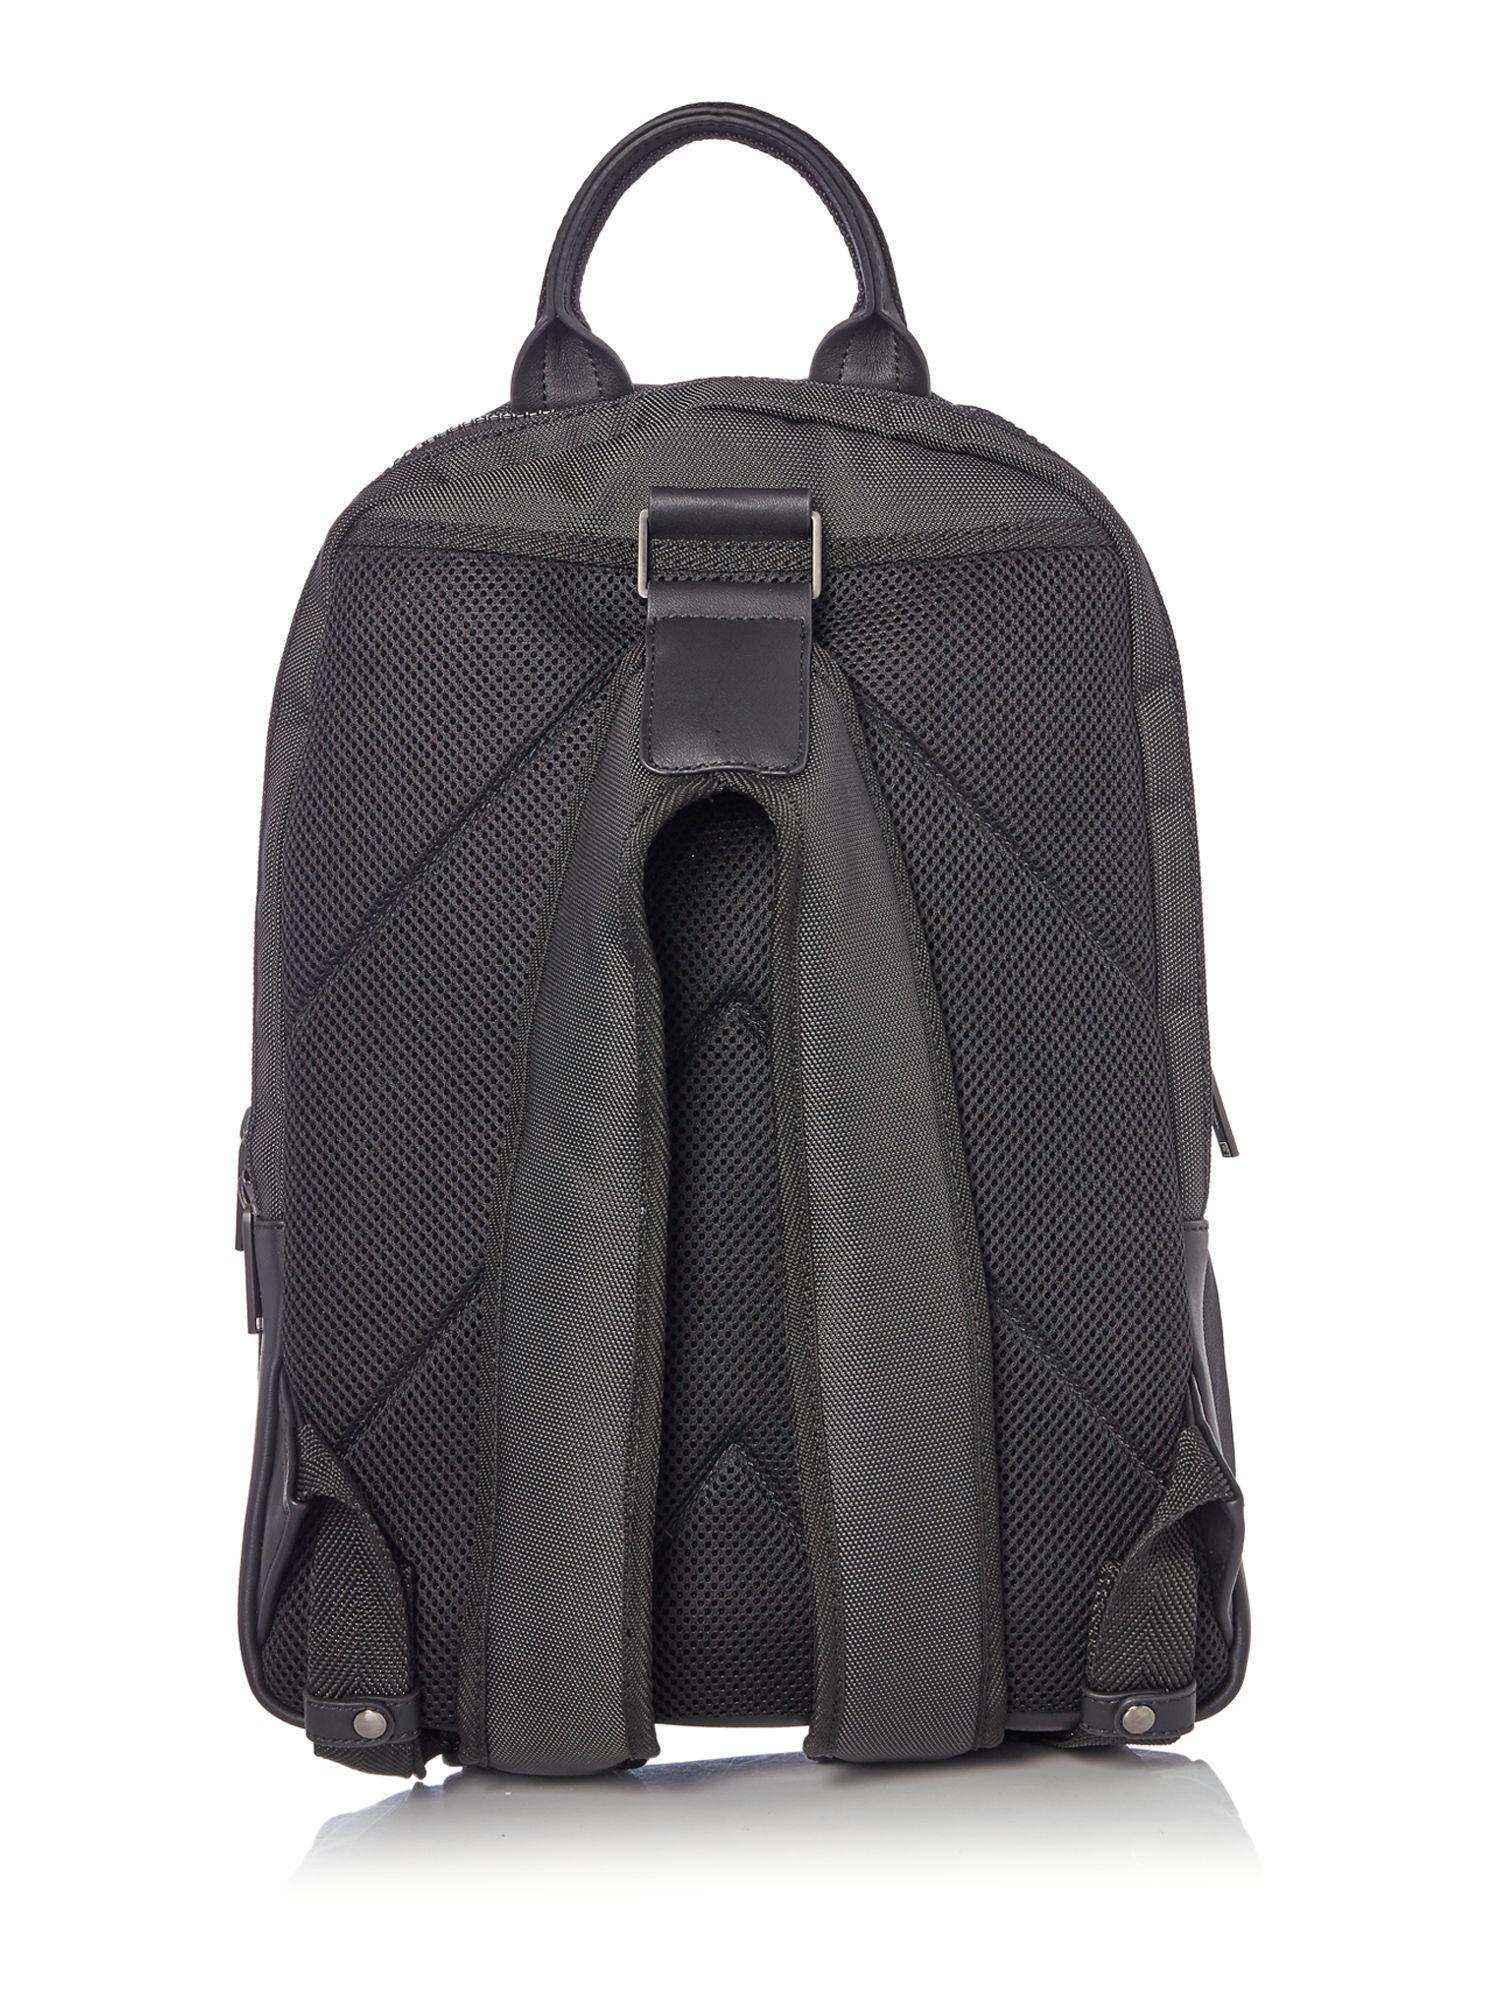 calvin klein zone nylon backpack in black for men lyst. Black Bedroom Furniture Sets. Home Design Ideas